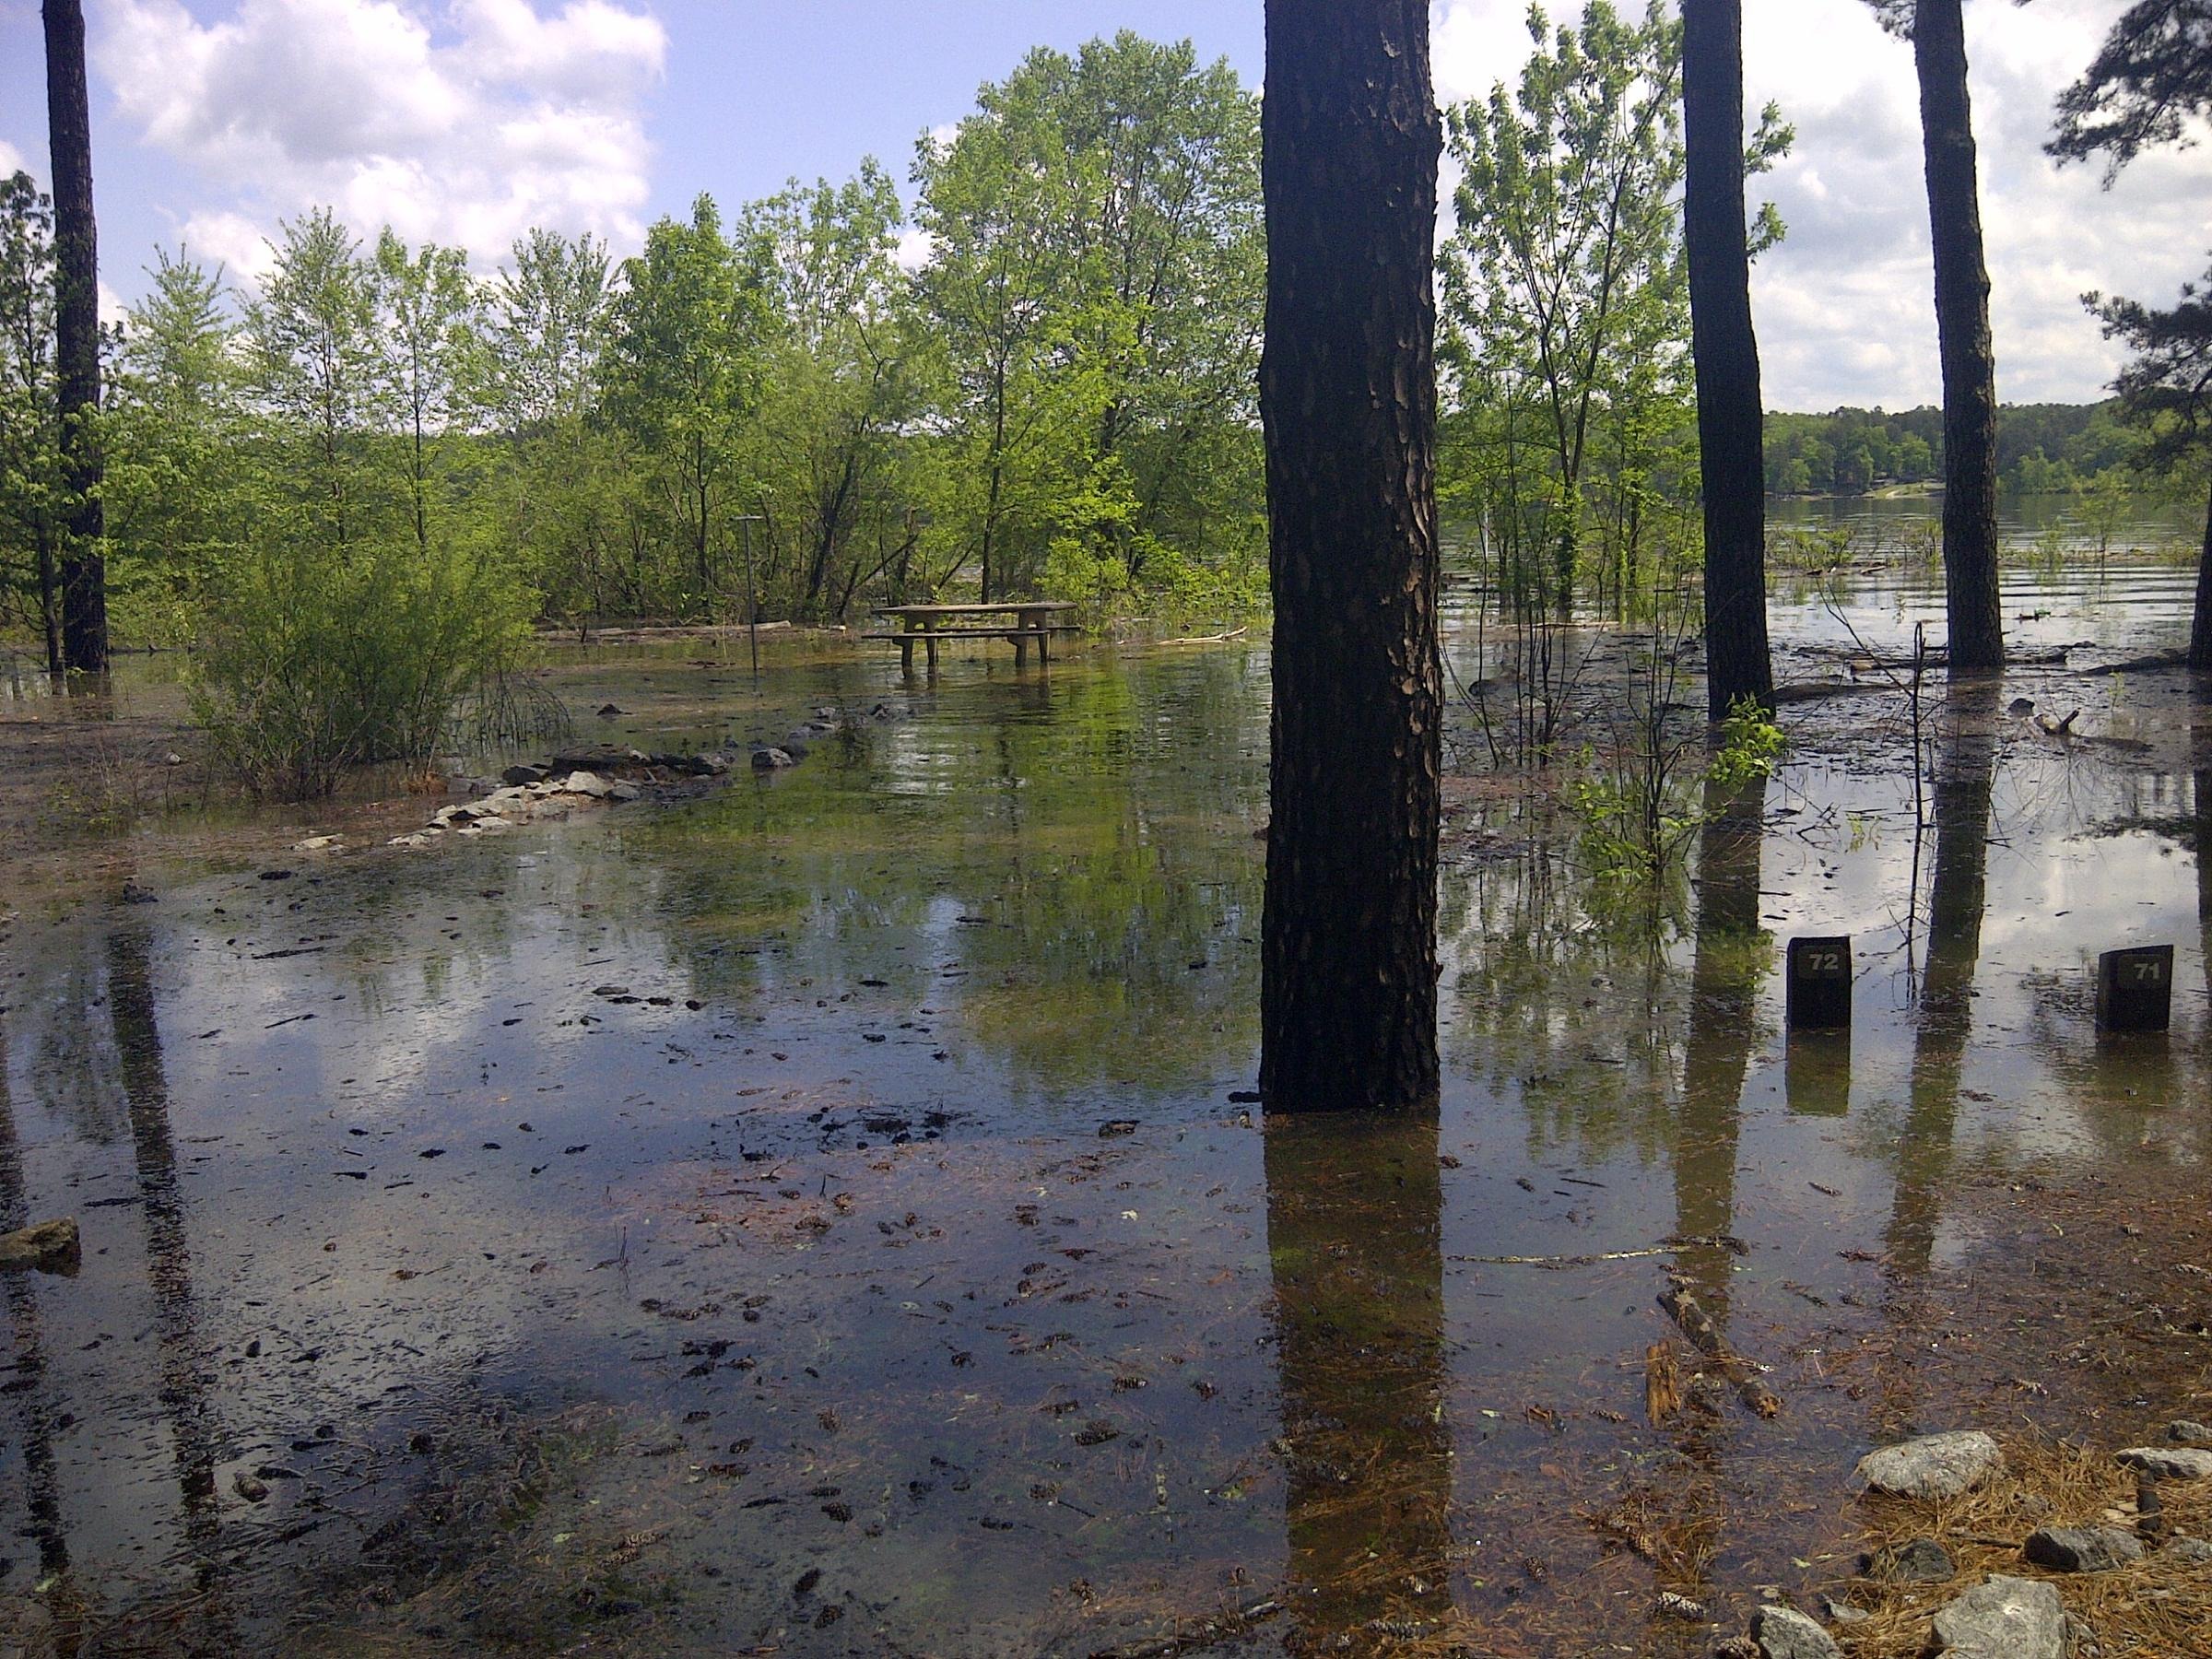 Lake Allatoona Flooding Shuts Down Area Campsites, Boat